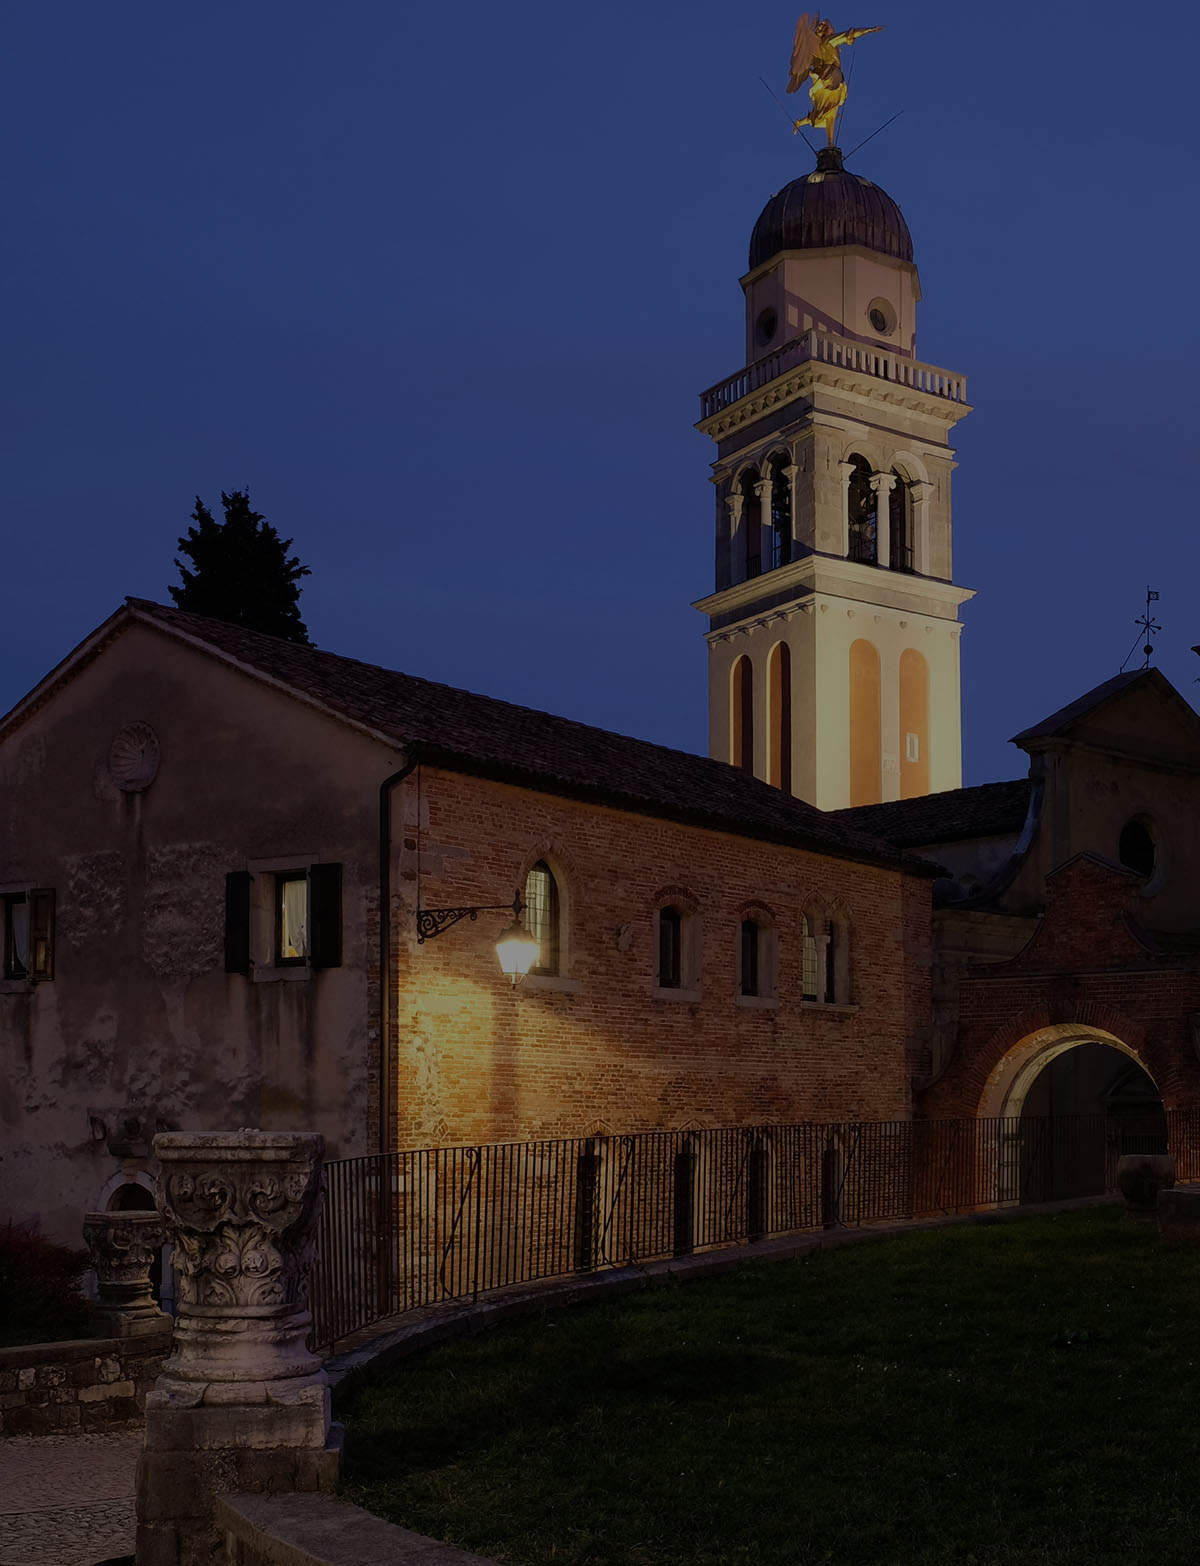 Casa della Confraternita - Anderen Orten